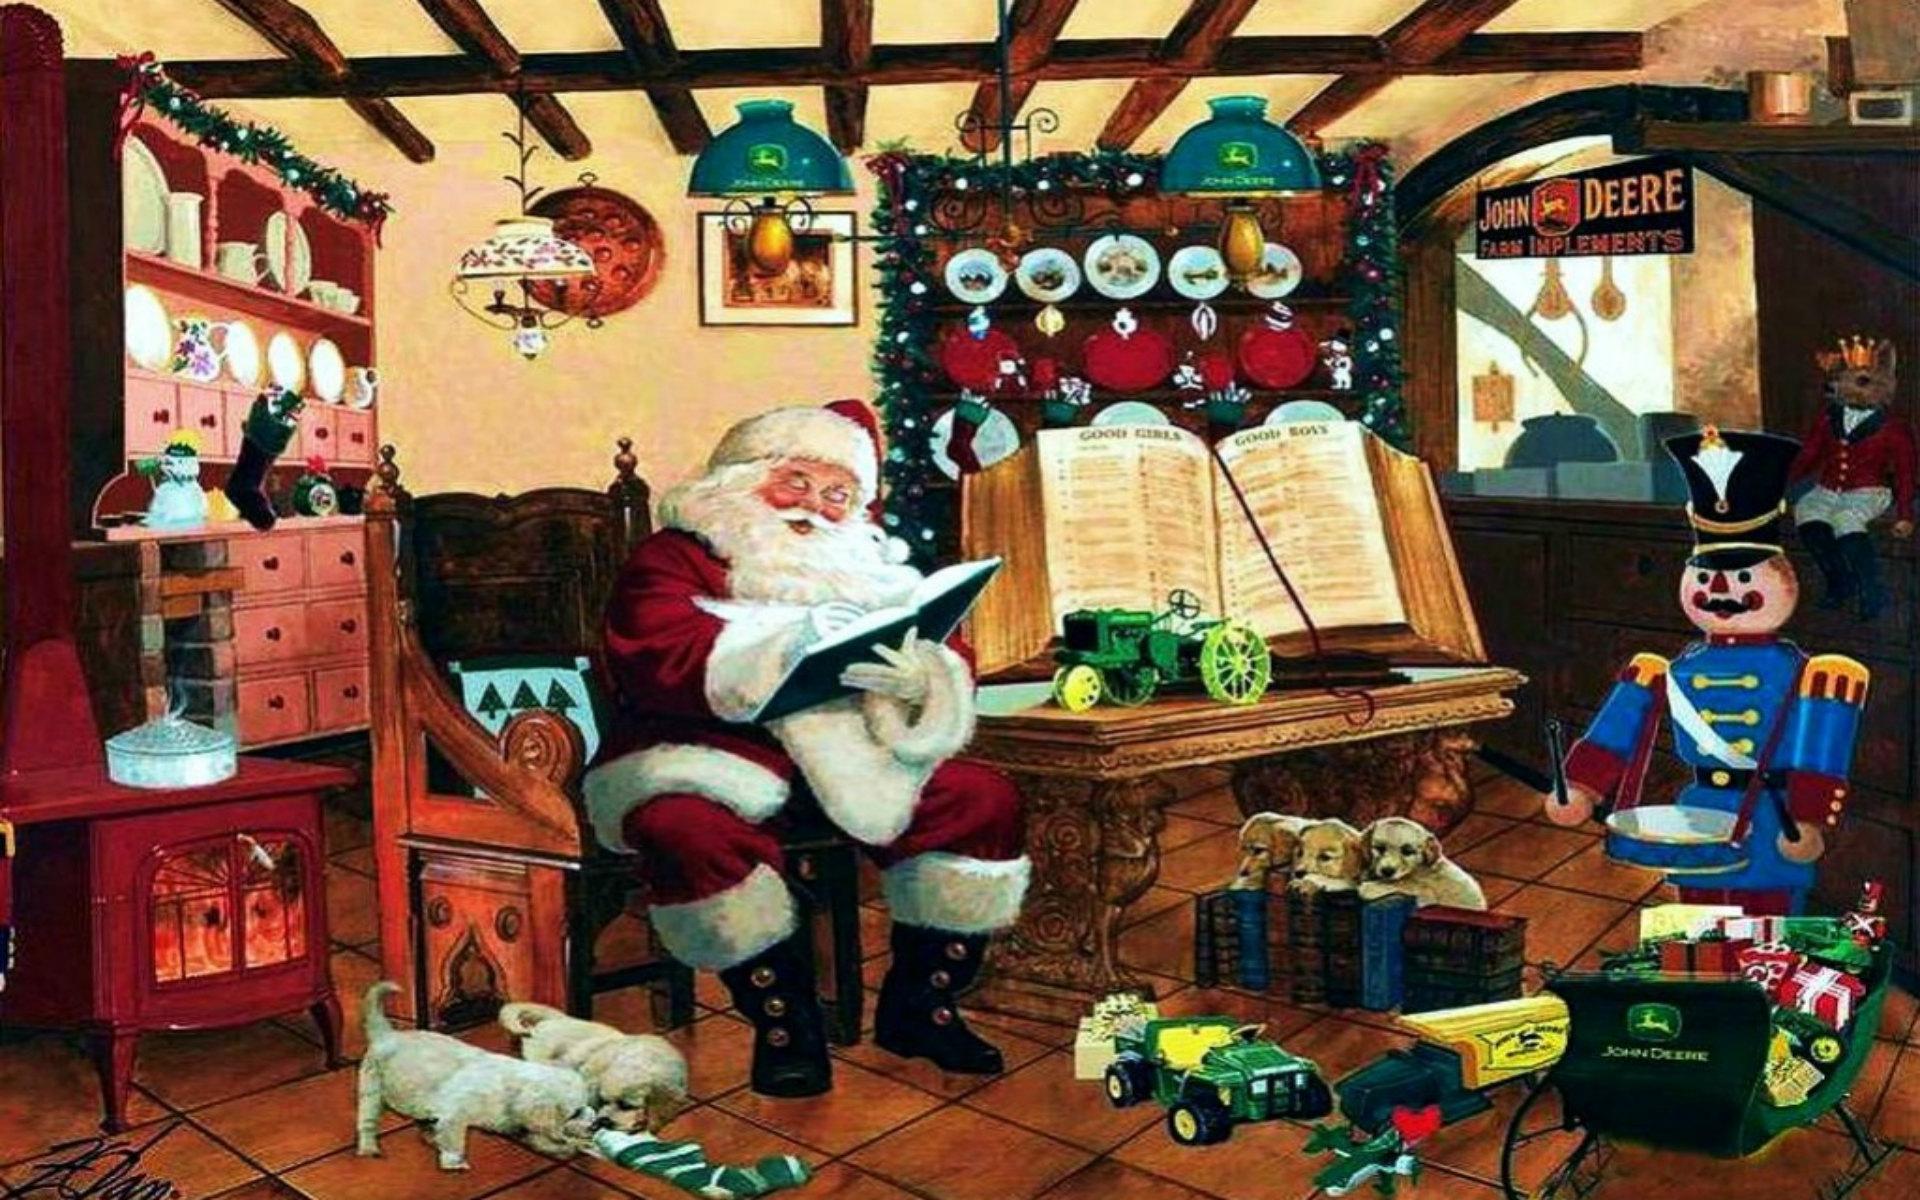 1920x1200px Old Fashioned Christmas Wallpaper - WallpaperSafari